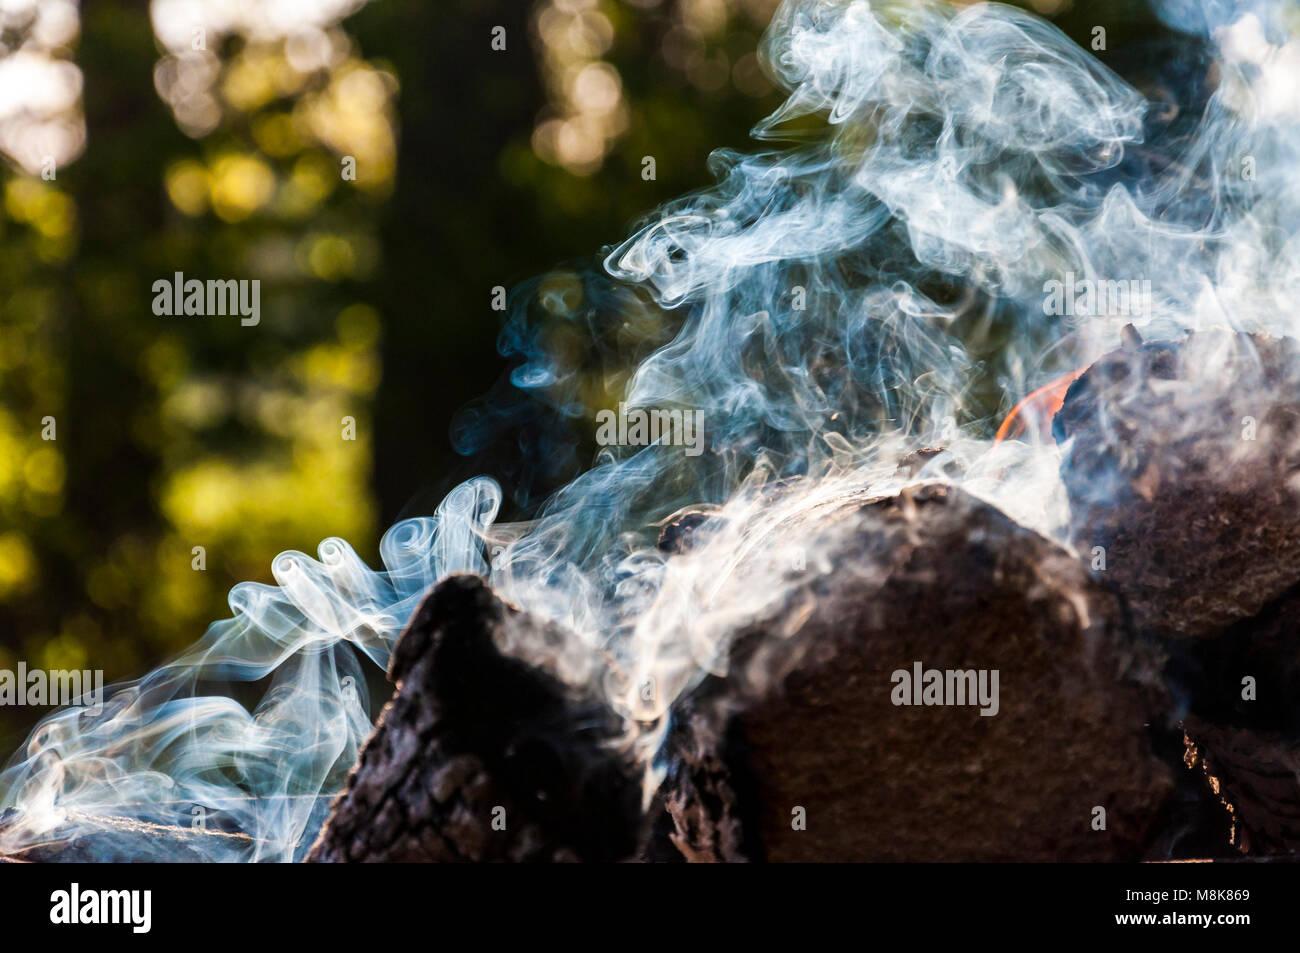 Burning firewood makes various smoke scroll shapes - Stock Image